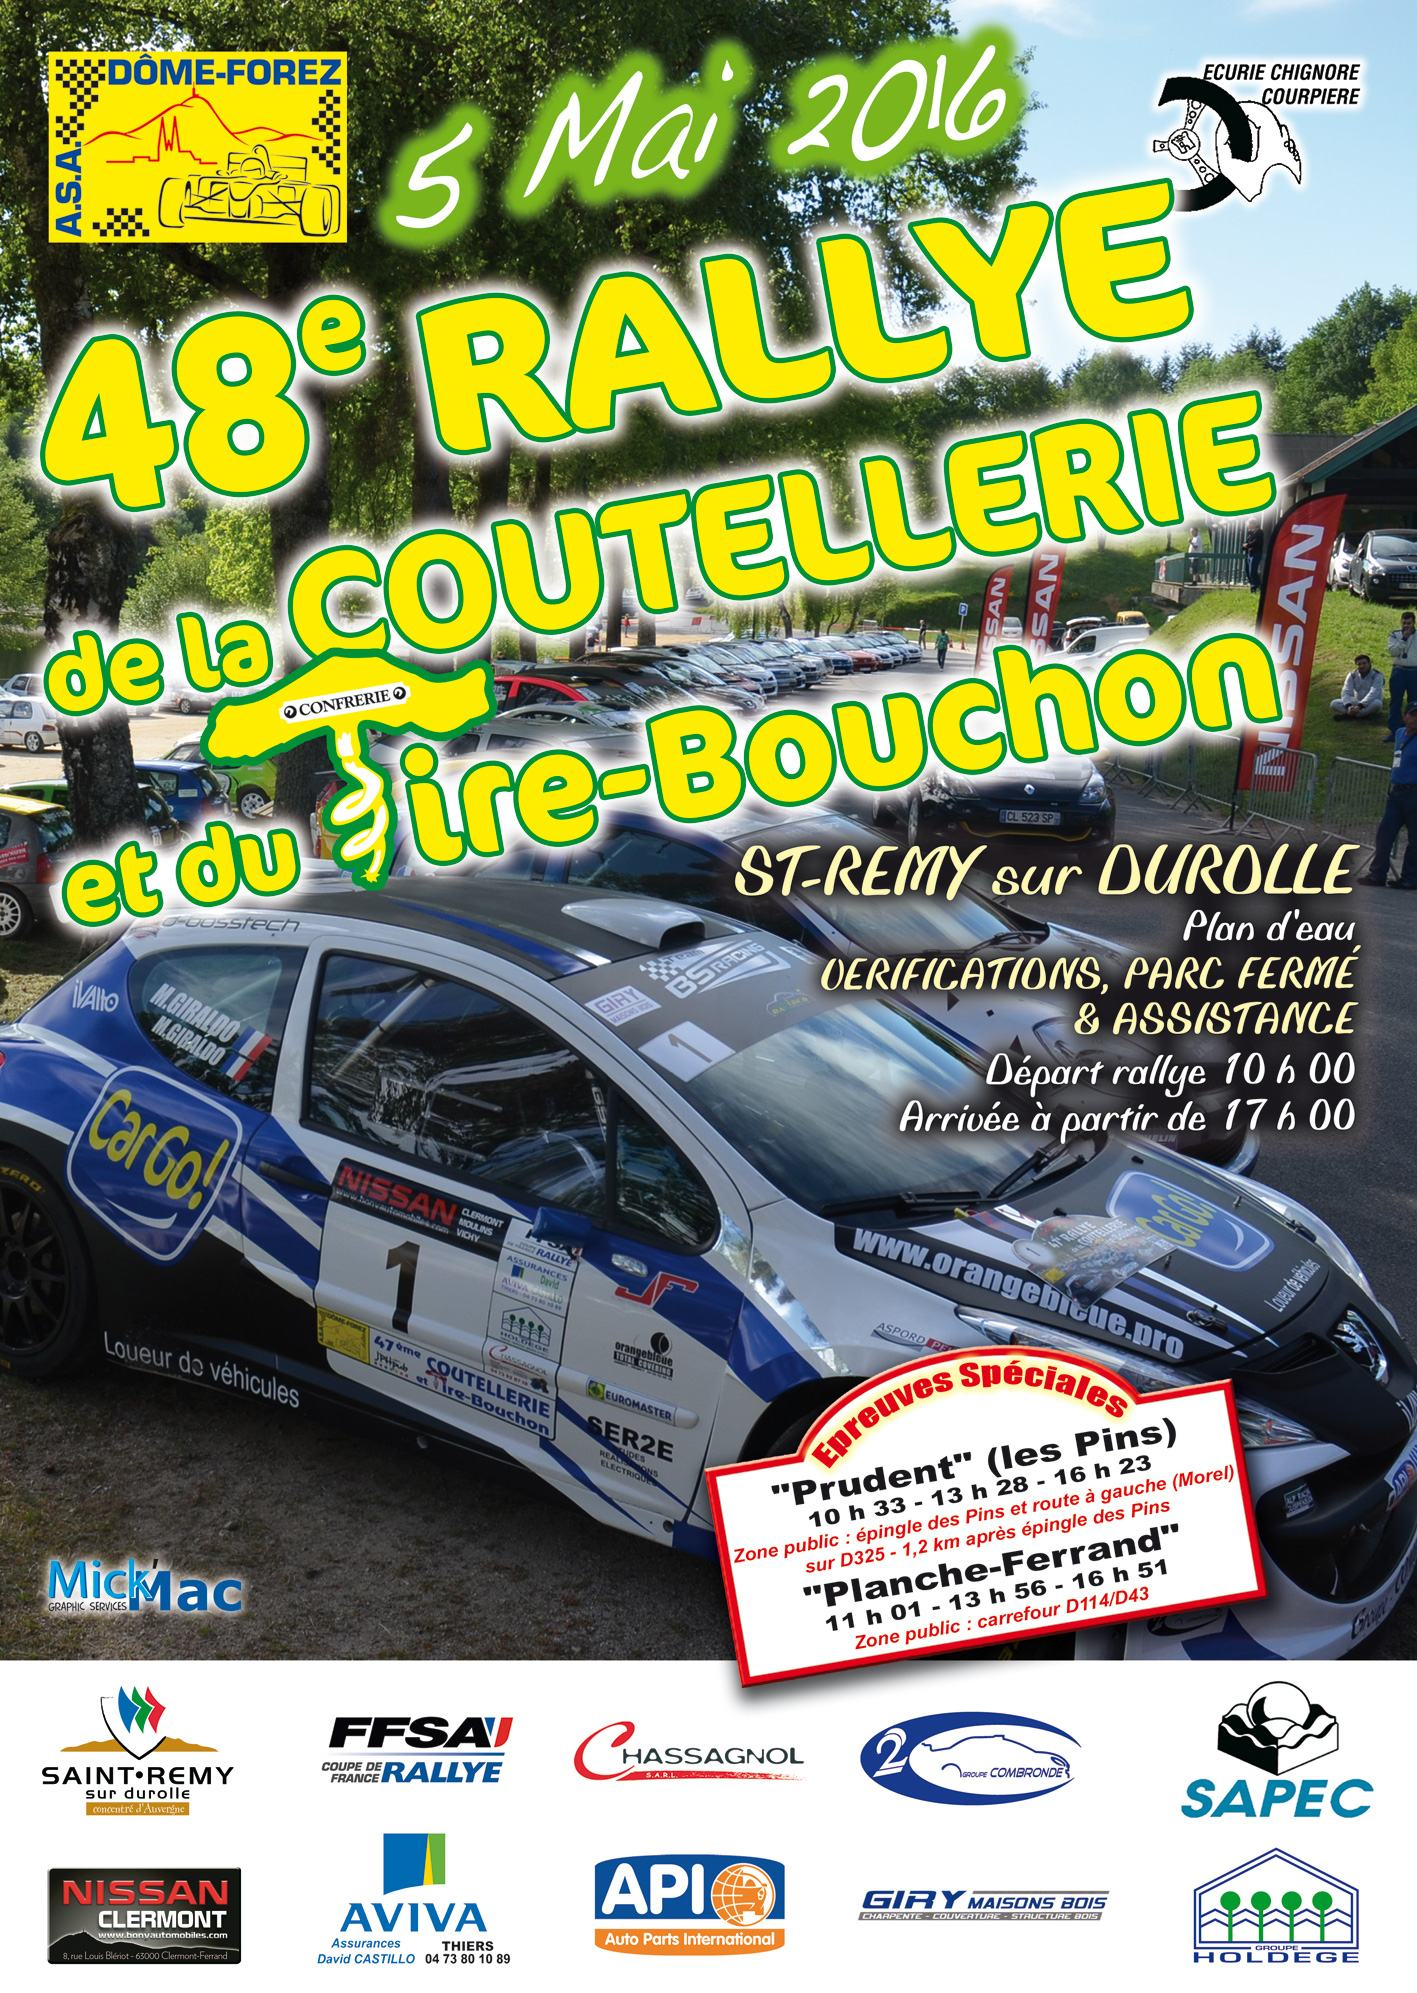 Rallye-de-la-Coutellerie-2016